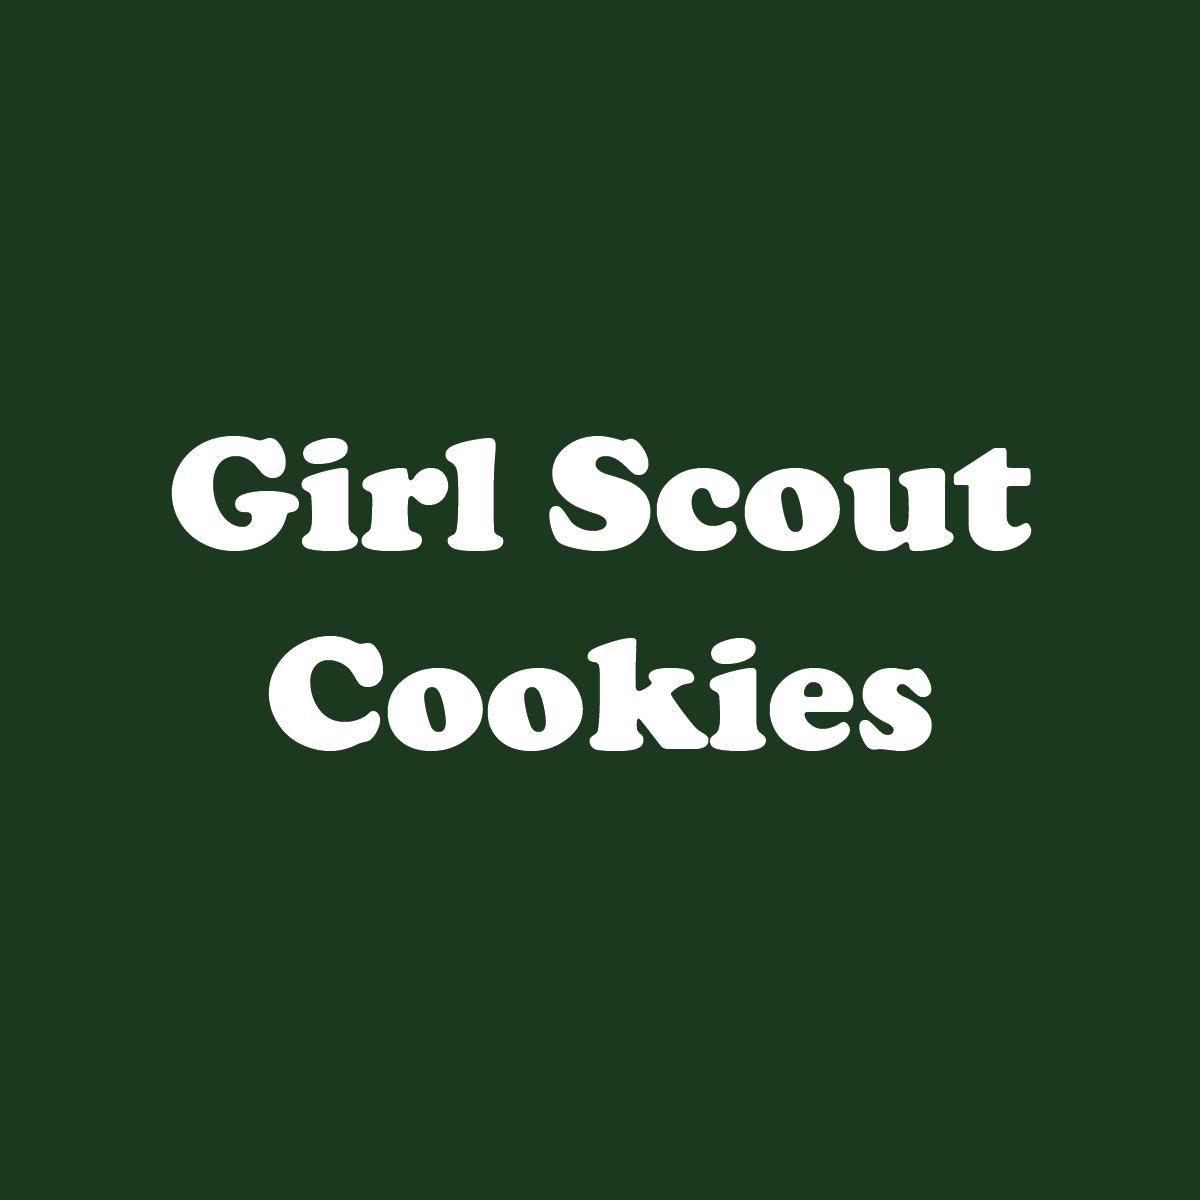 GirlScoutCookies.png